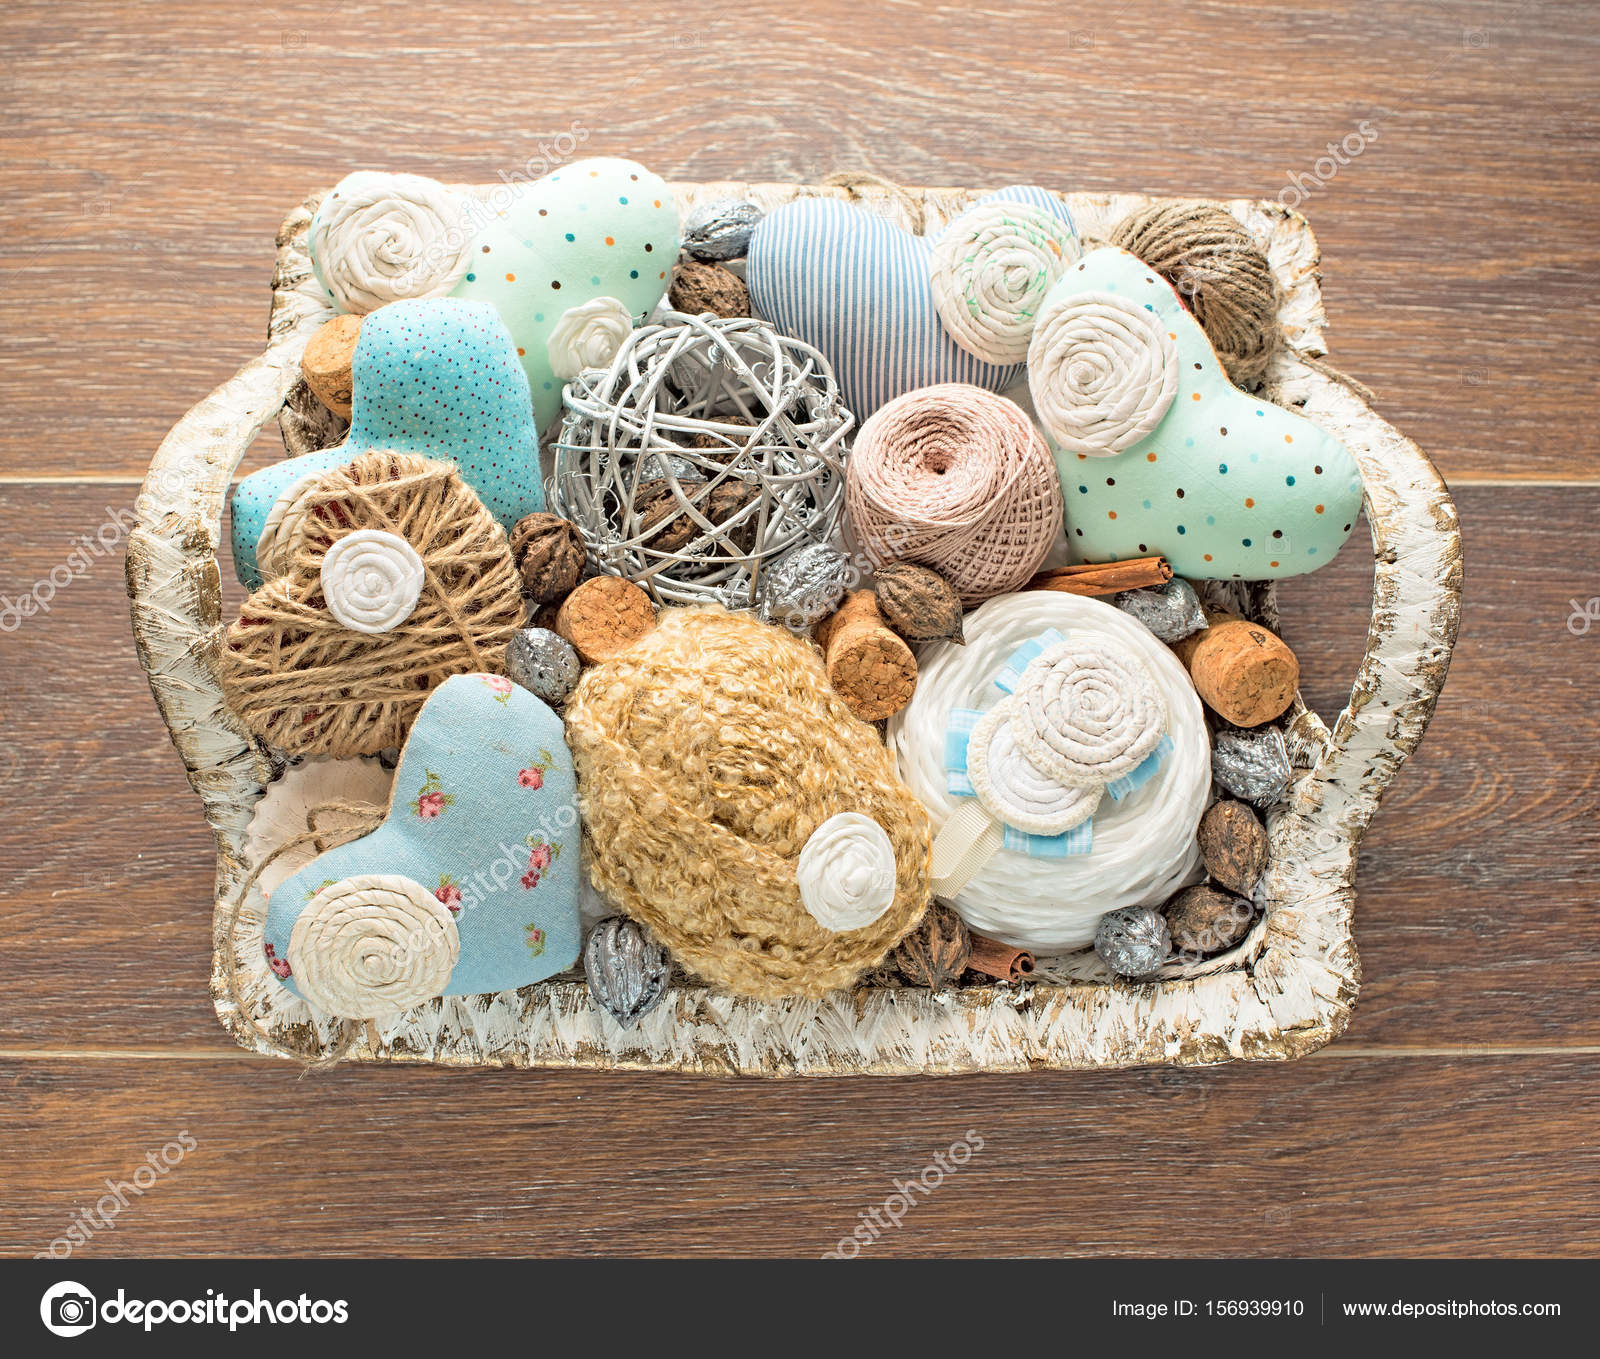 Basket for needlework 7